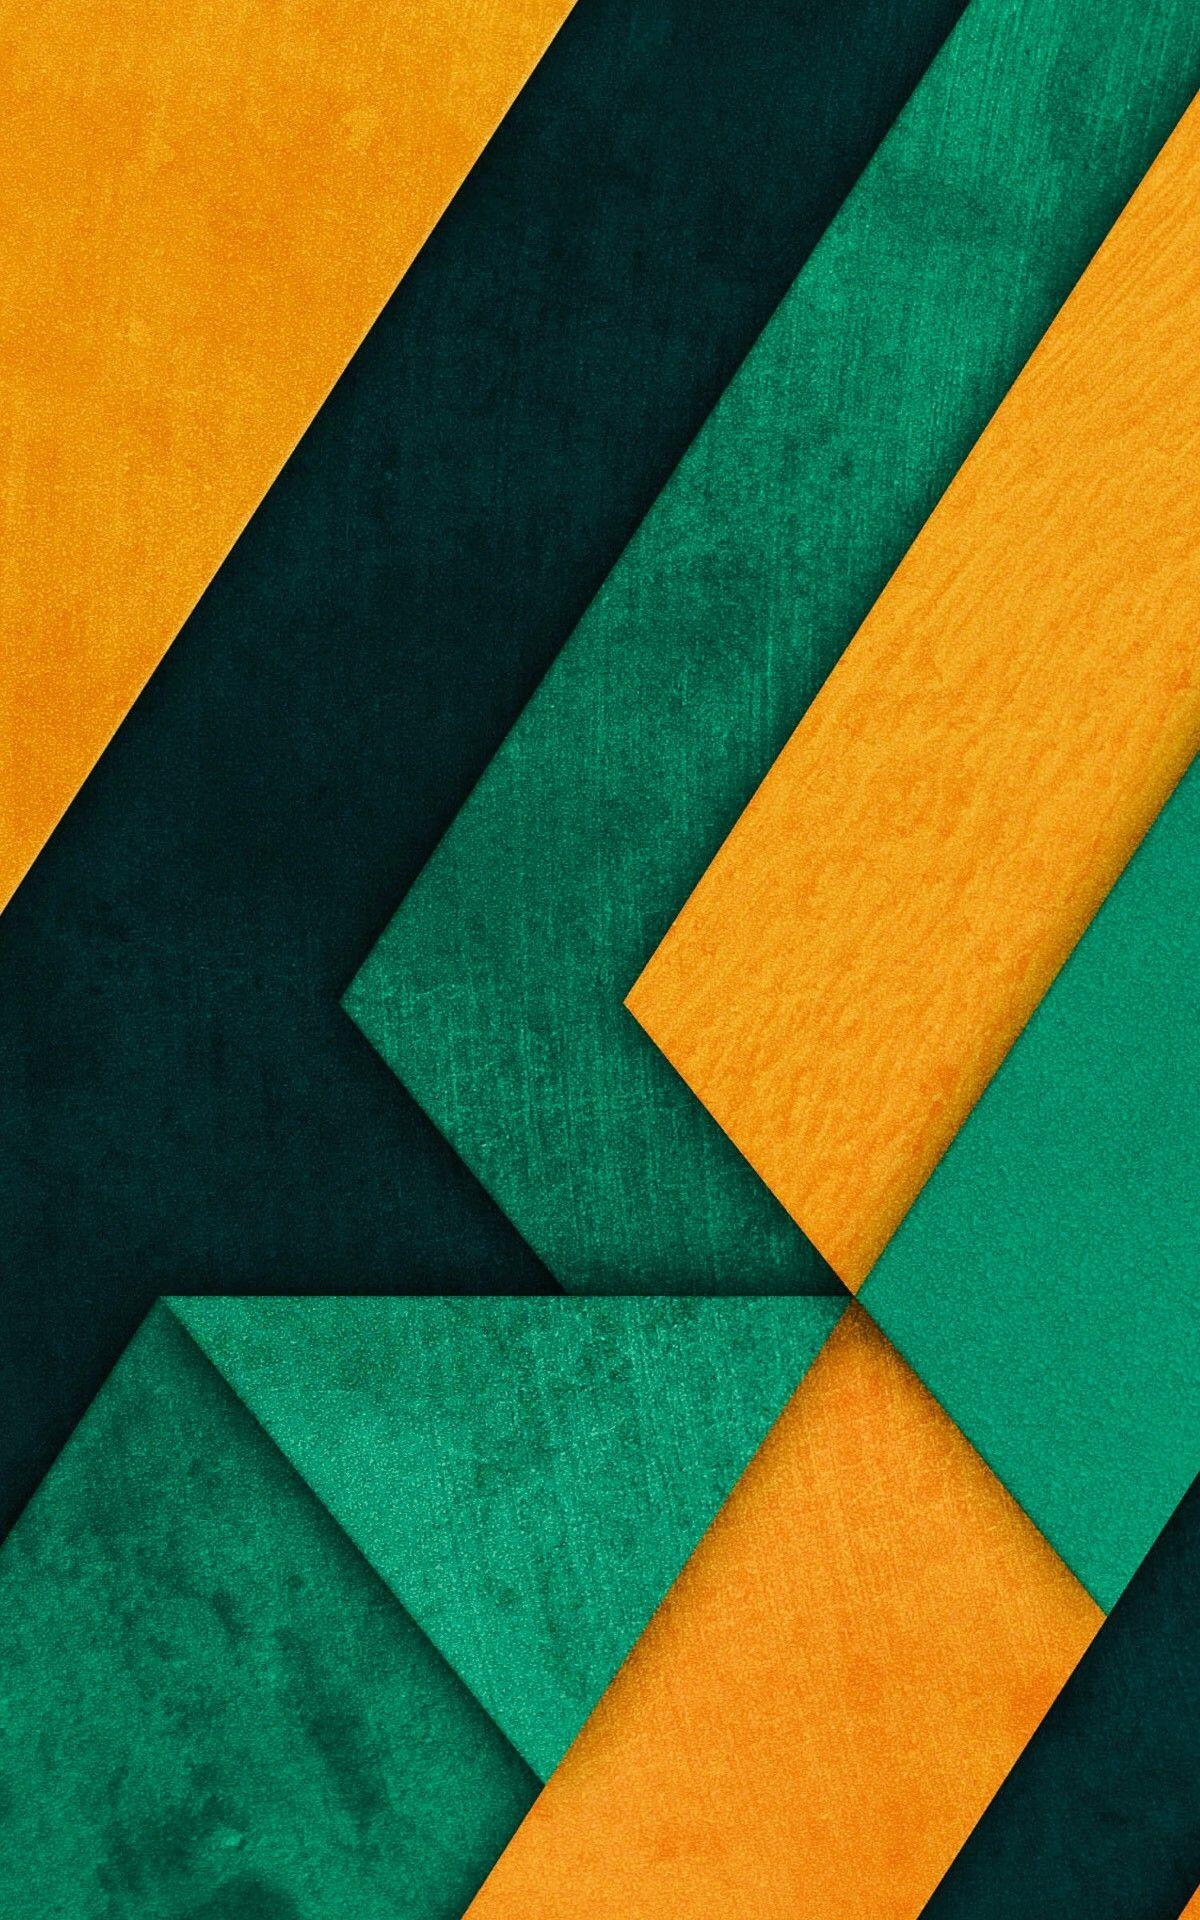 Pin by zryan sharif on zryan pinterest wallpaper - Material design mobile wallpaper ...